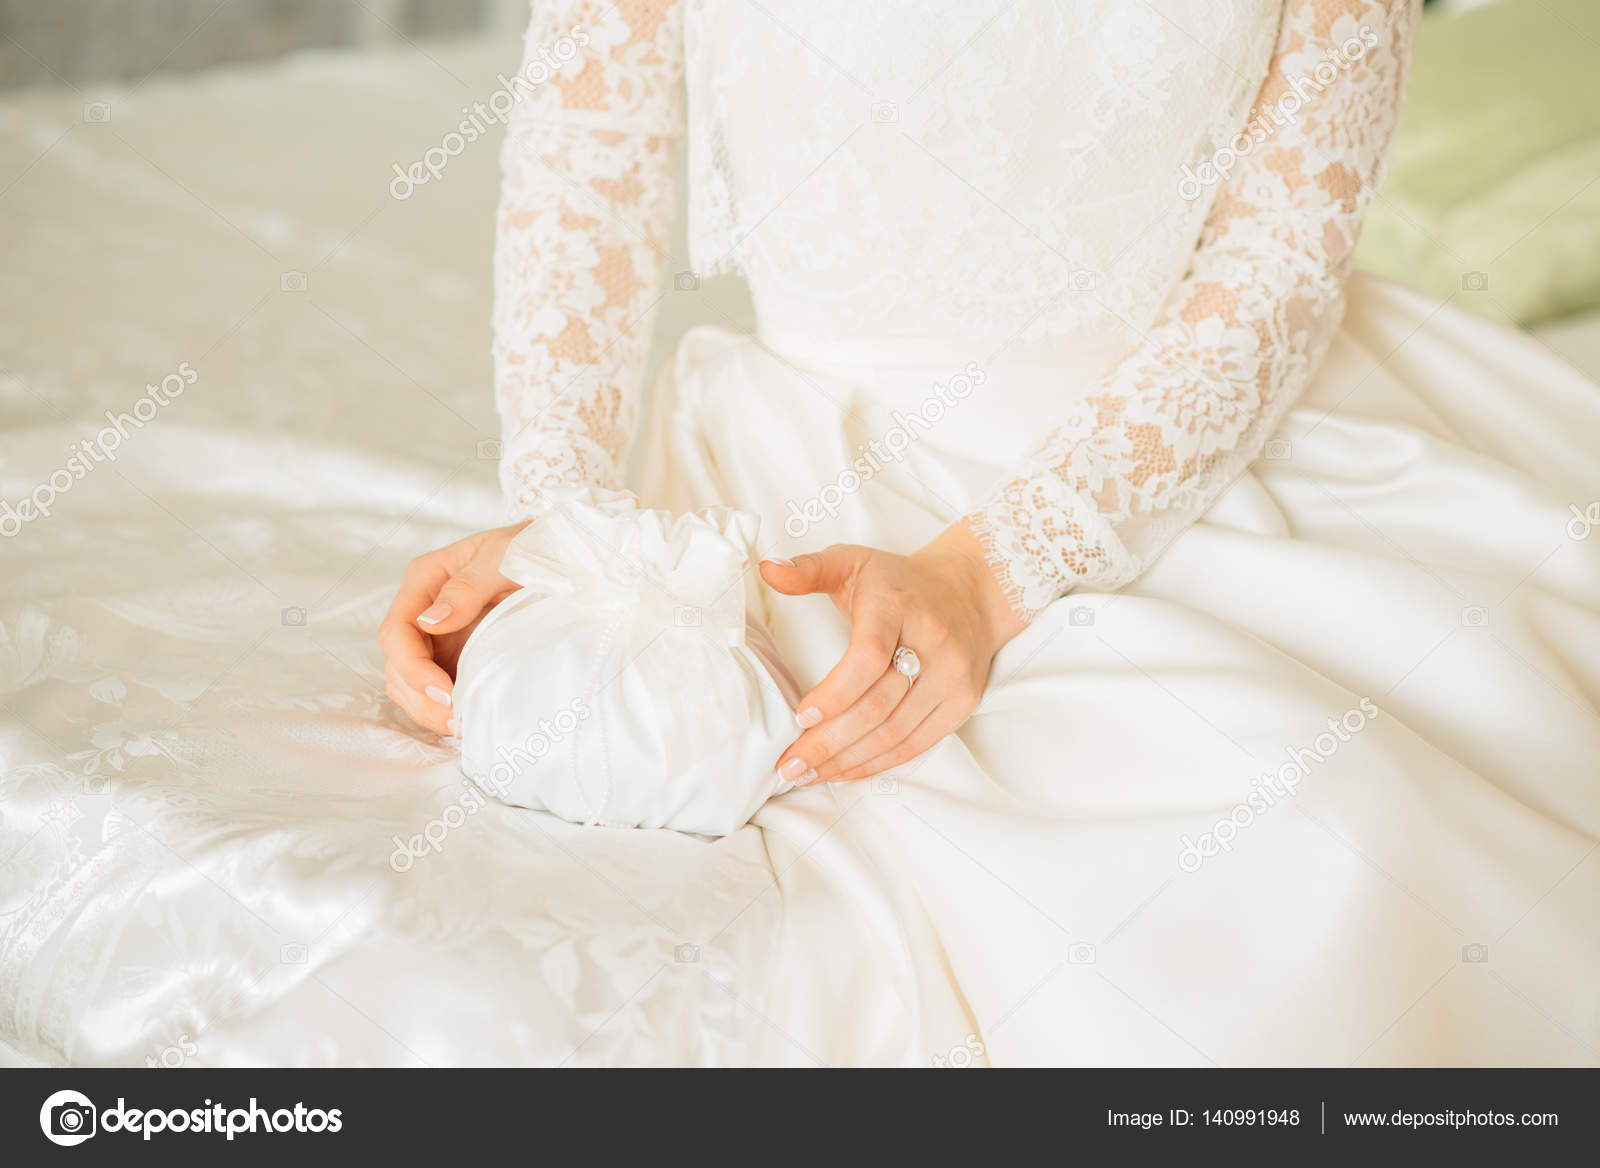 ea91ce342b Η νύφη βγάζει ένα κουτί λευκό τσάντα με βέρες ή ένα δώρο — Φωτογραφία  Αρχείου